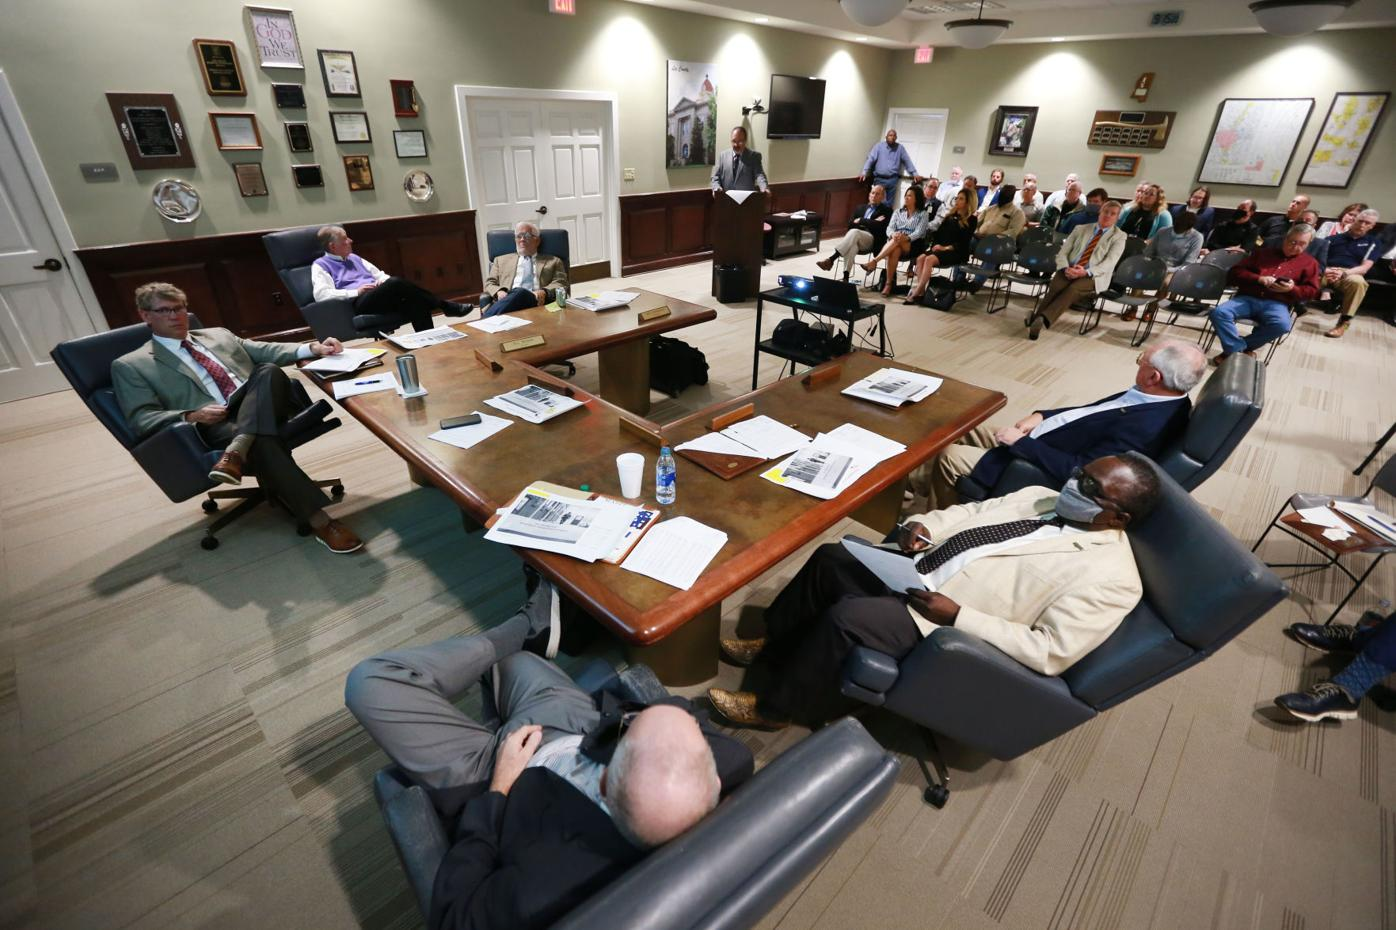 djr-2021-04-20-news-lee-county-jail-report-arp2